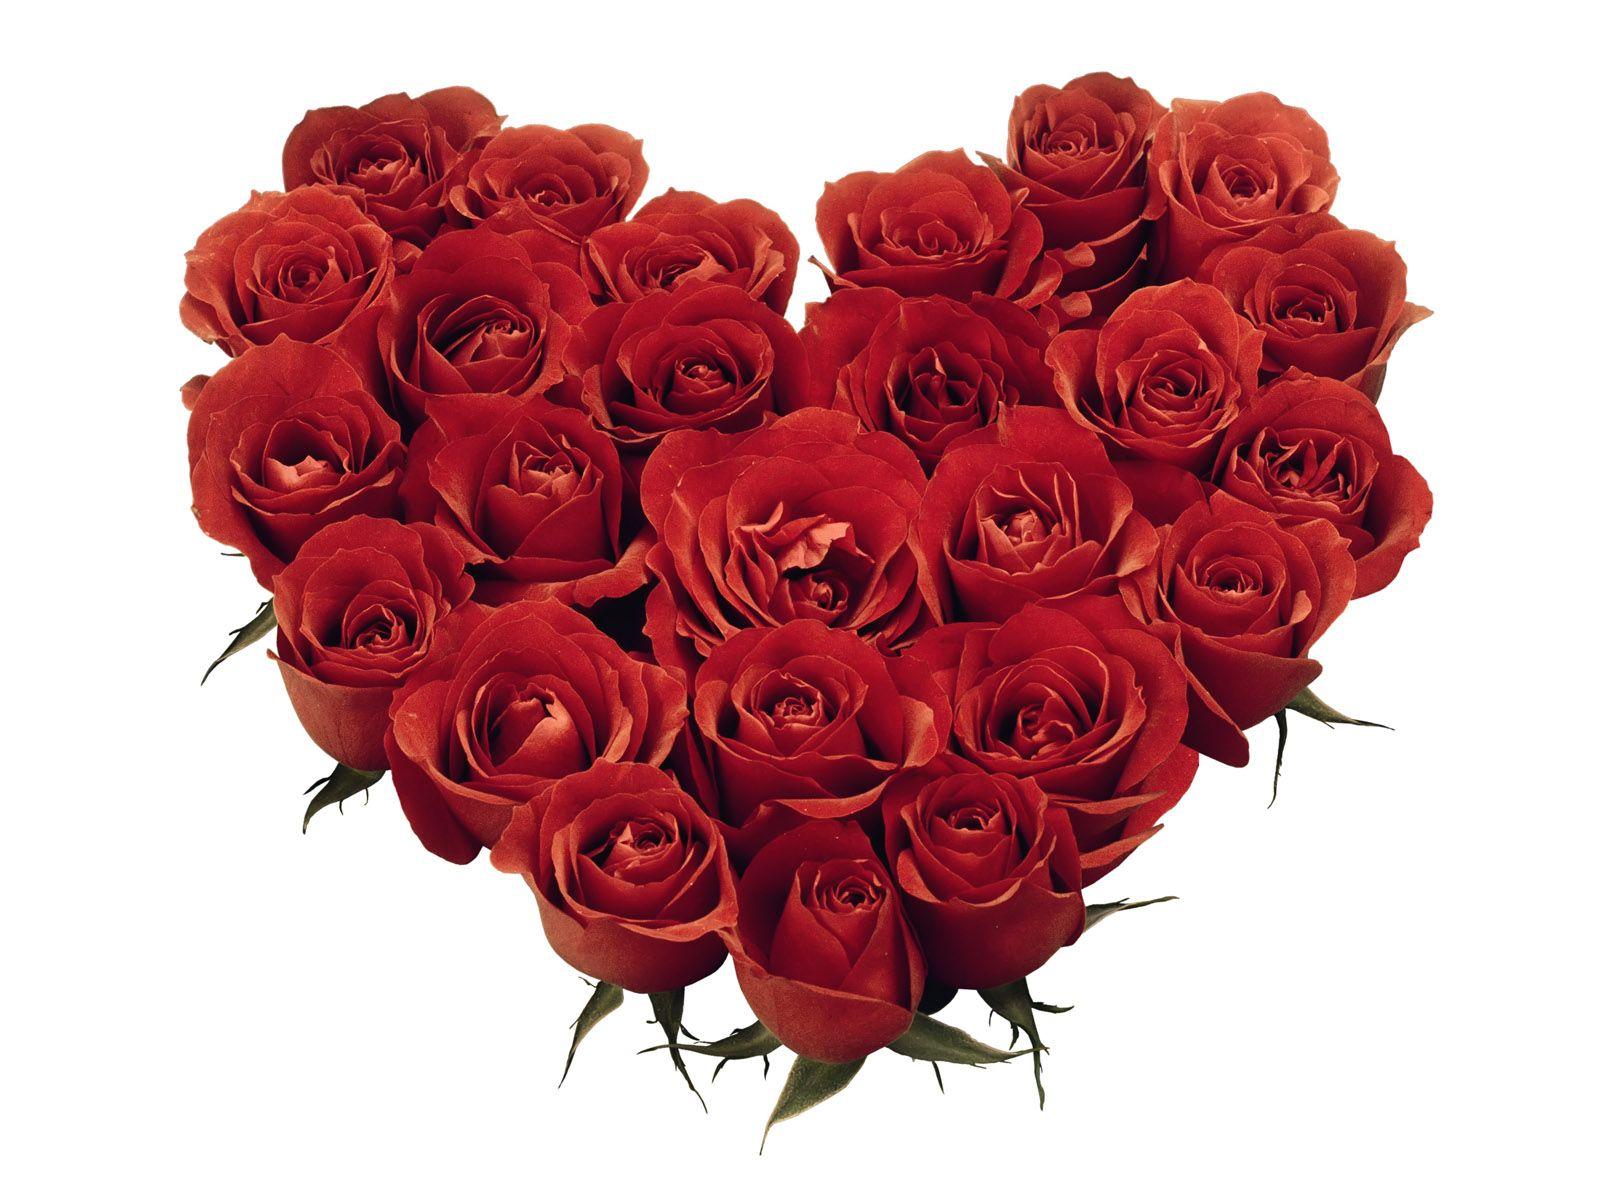 Valentine Day Gift Ideas for Boys/Girls in 2015 | Happy Valentine ...